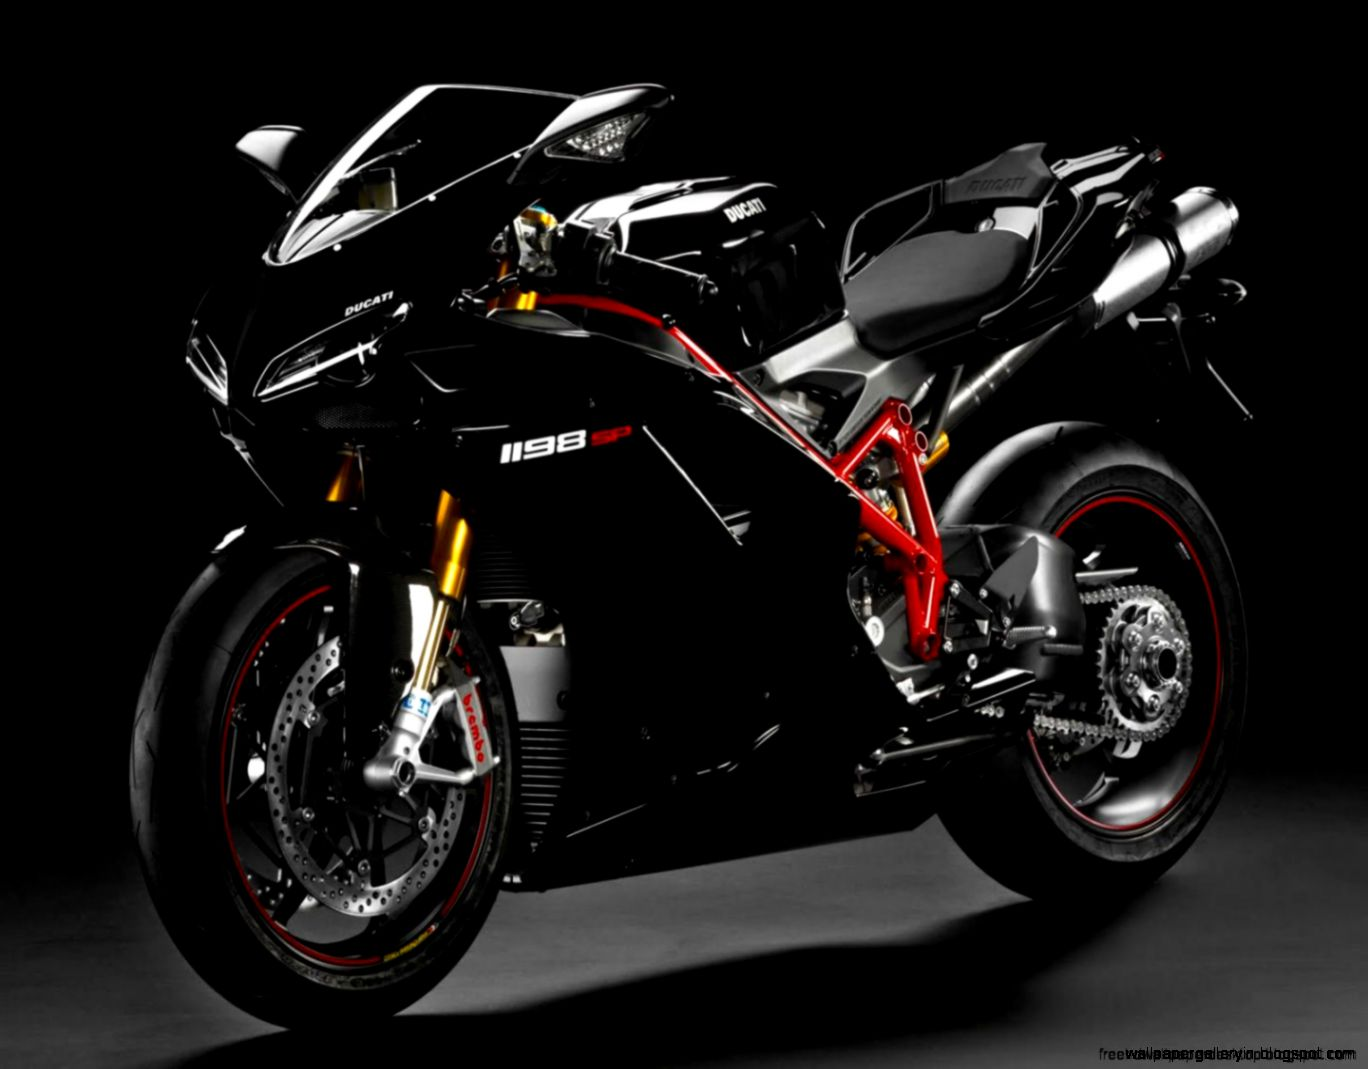 Ducati Superbike 1198 Background Desktop  Free High Definition